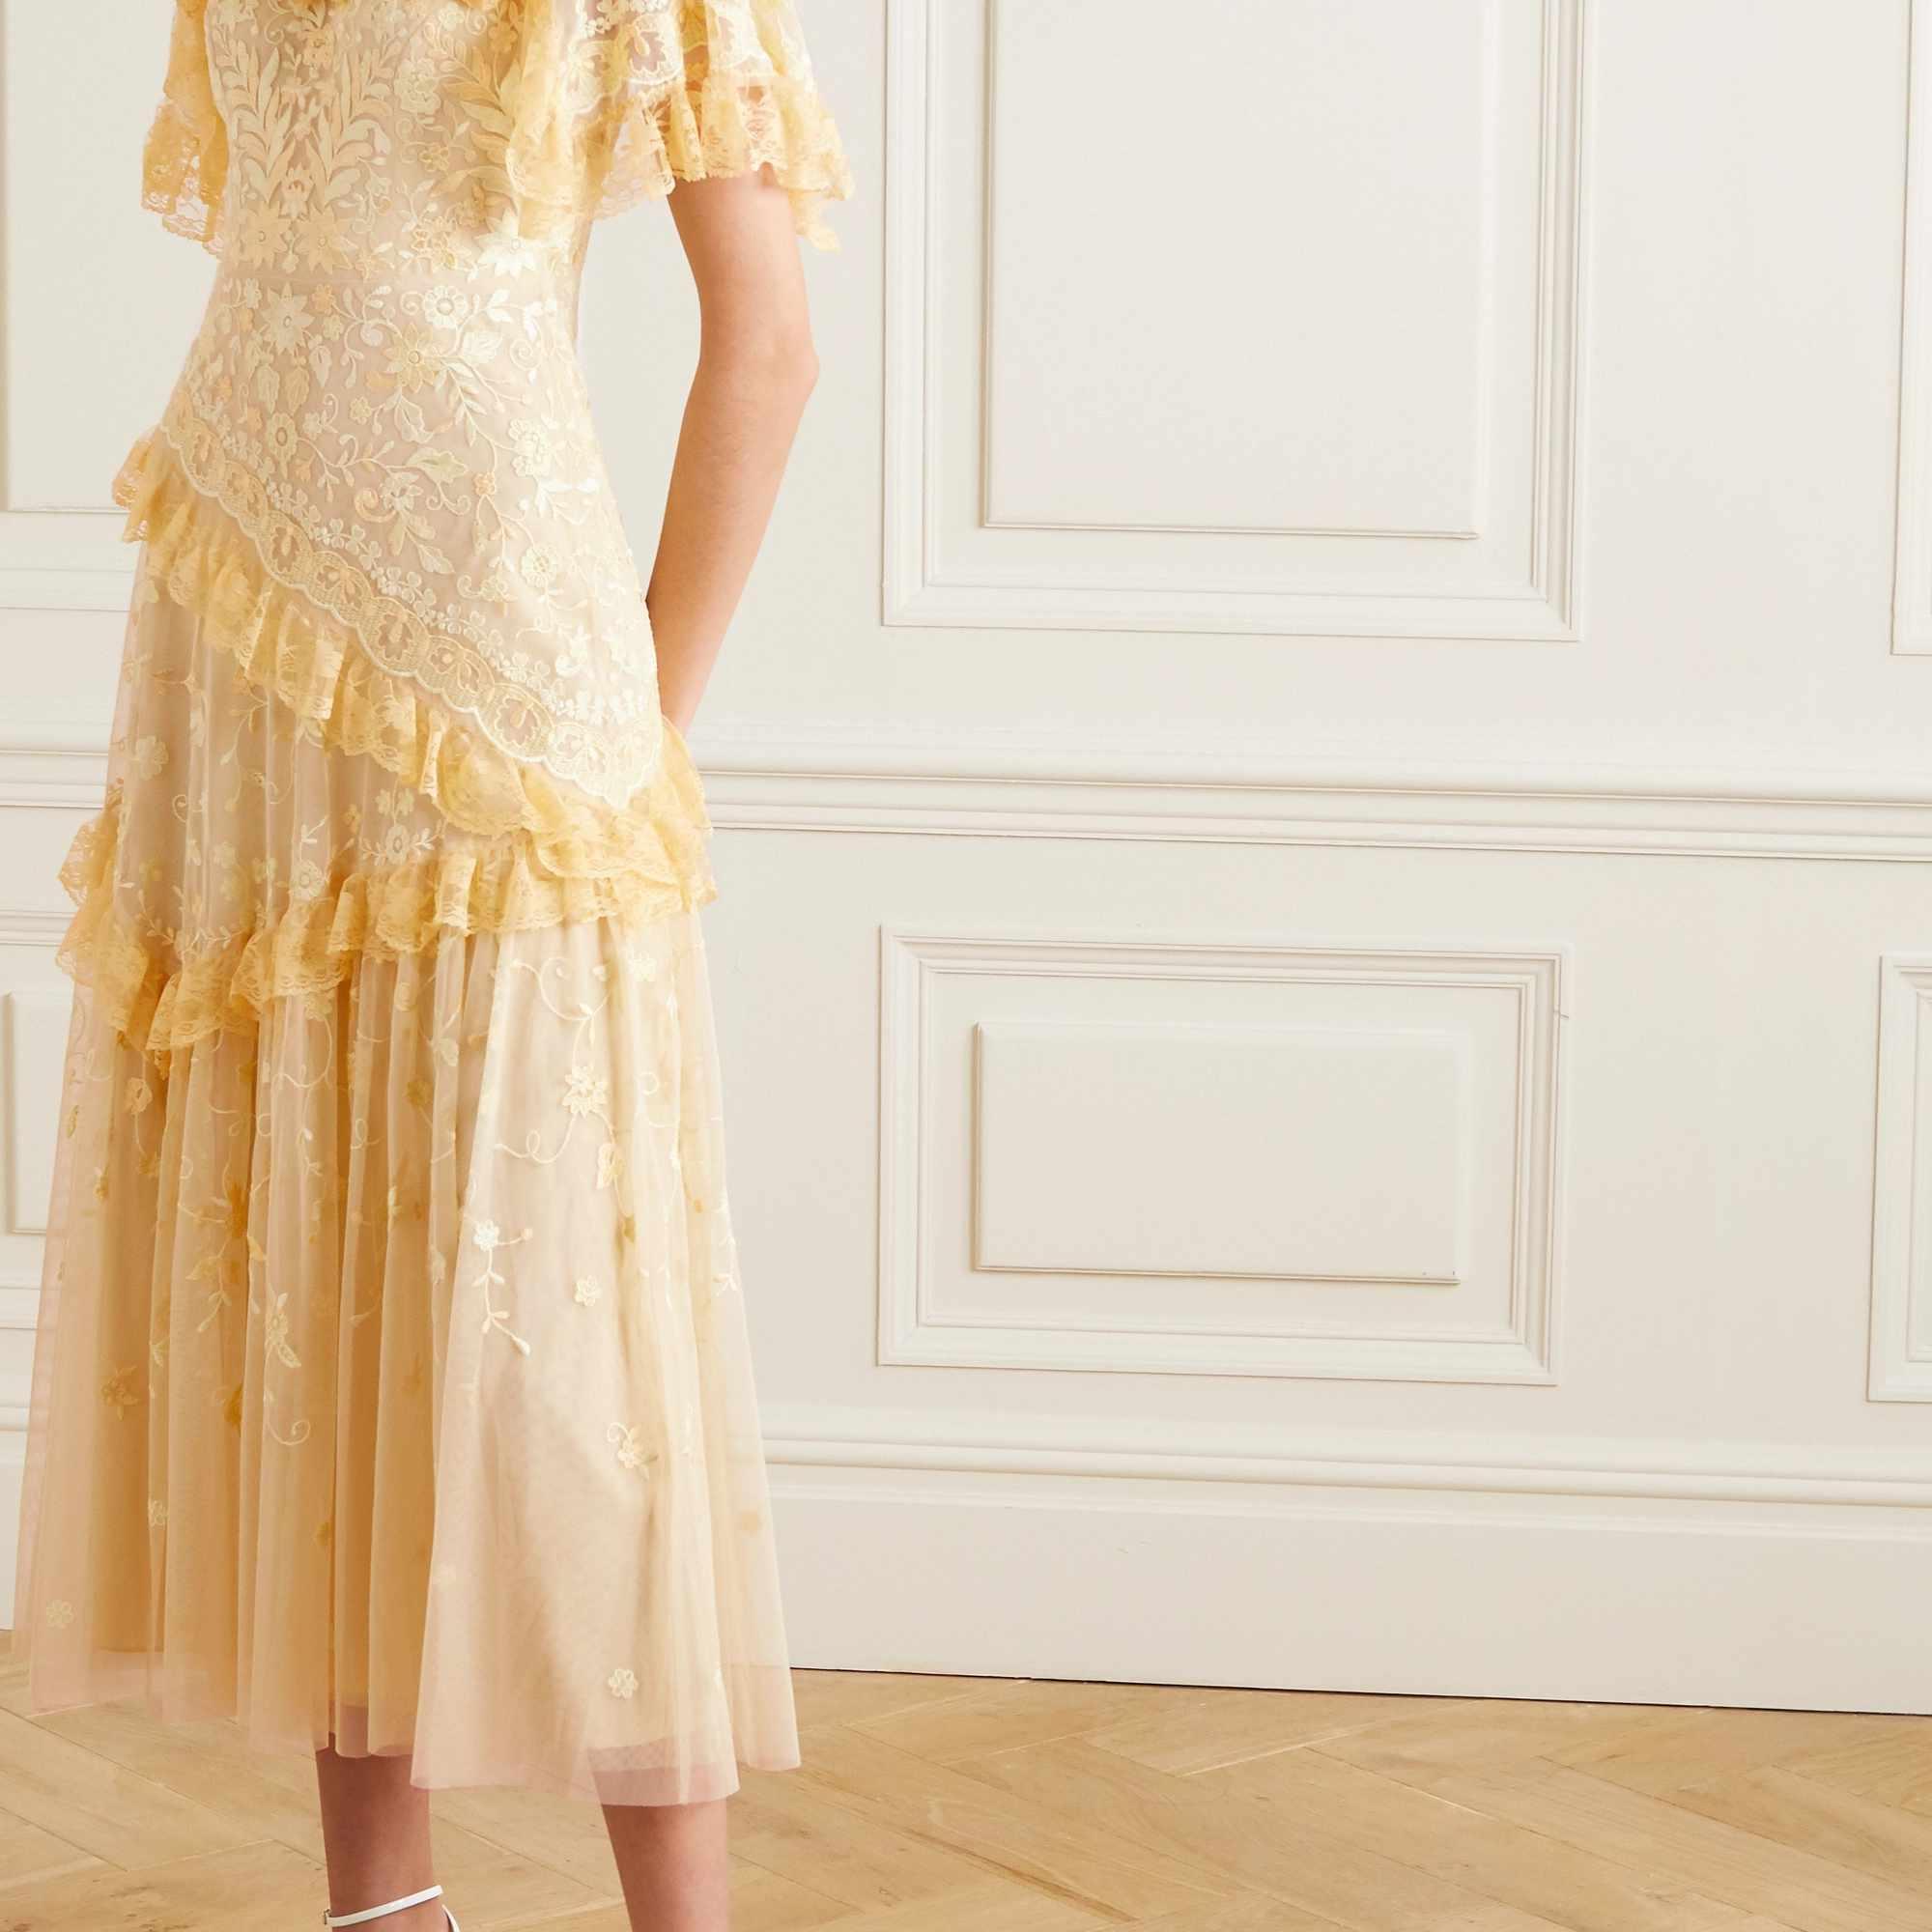 Needle & Thread x Jasmine Hemsley Earth Garden Lace-Trimmed Embroidered Tulle Midi Dress $475